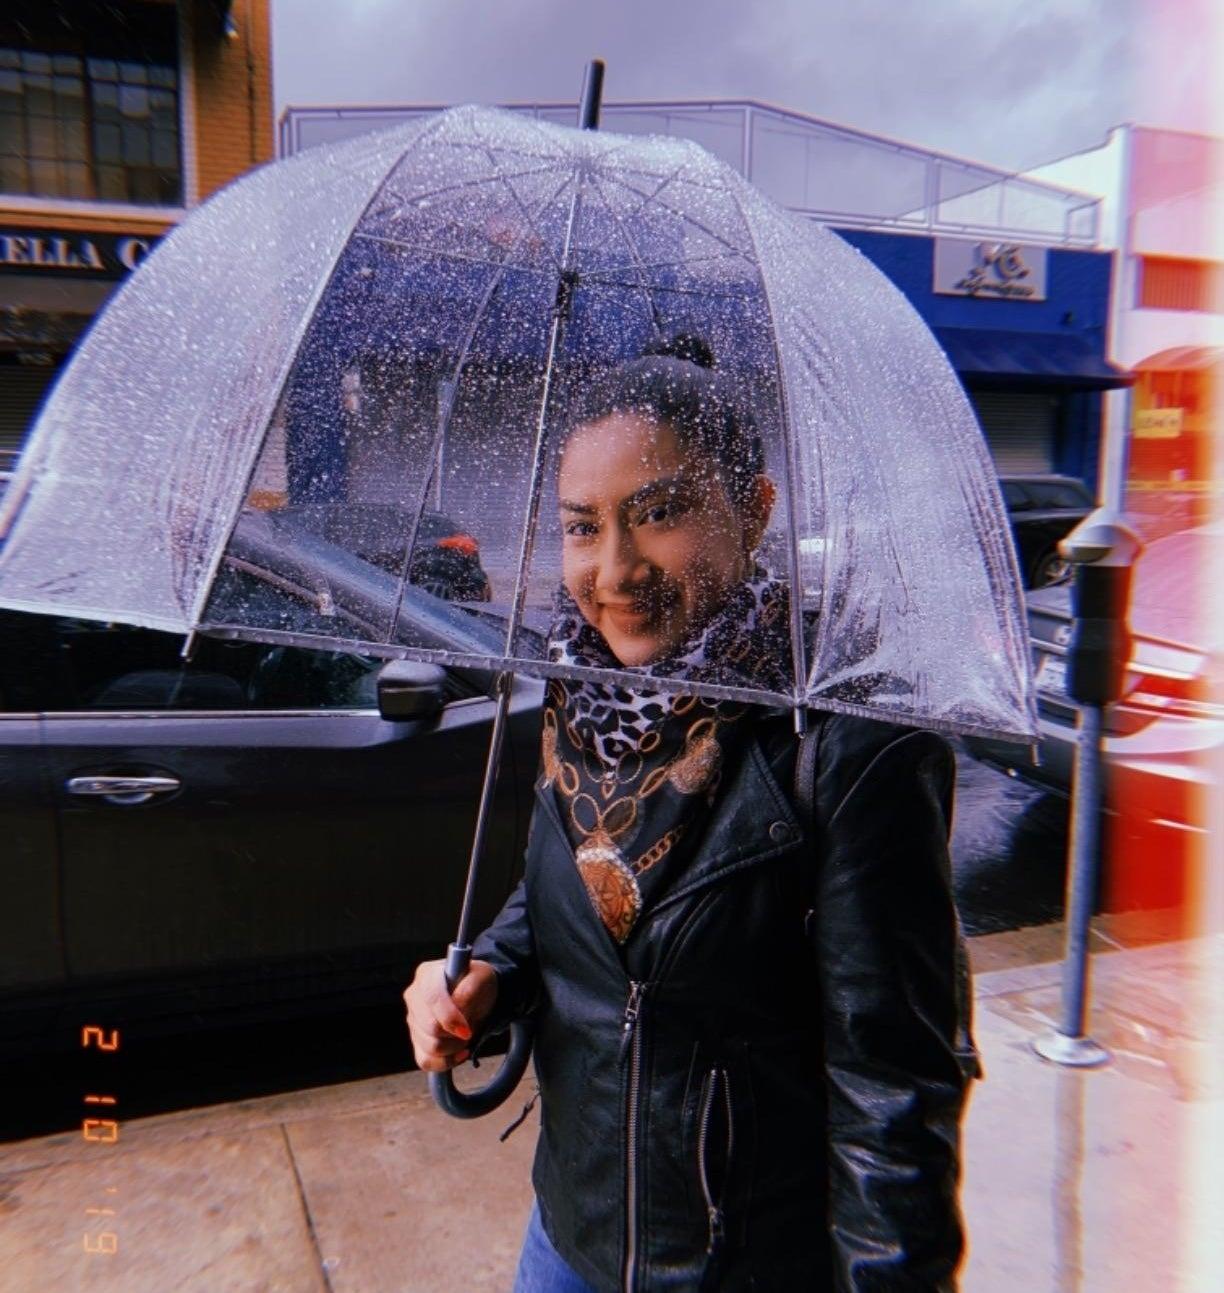 reviewer smiling through their clear umbrella